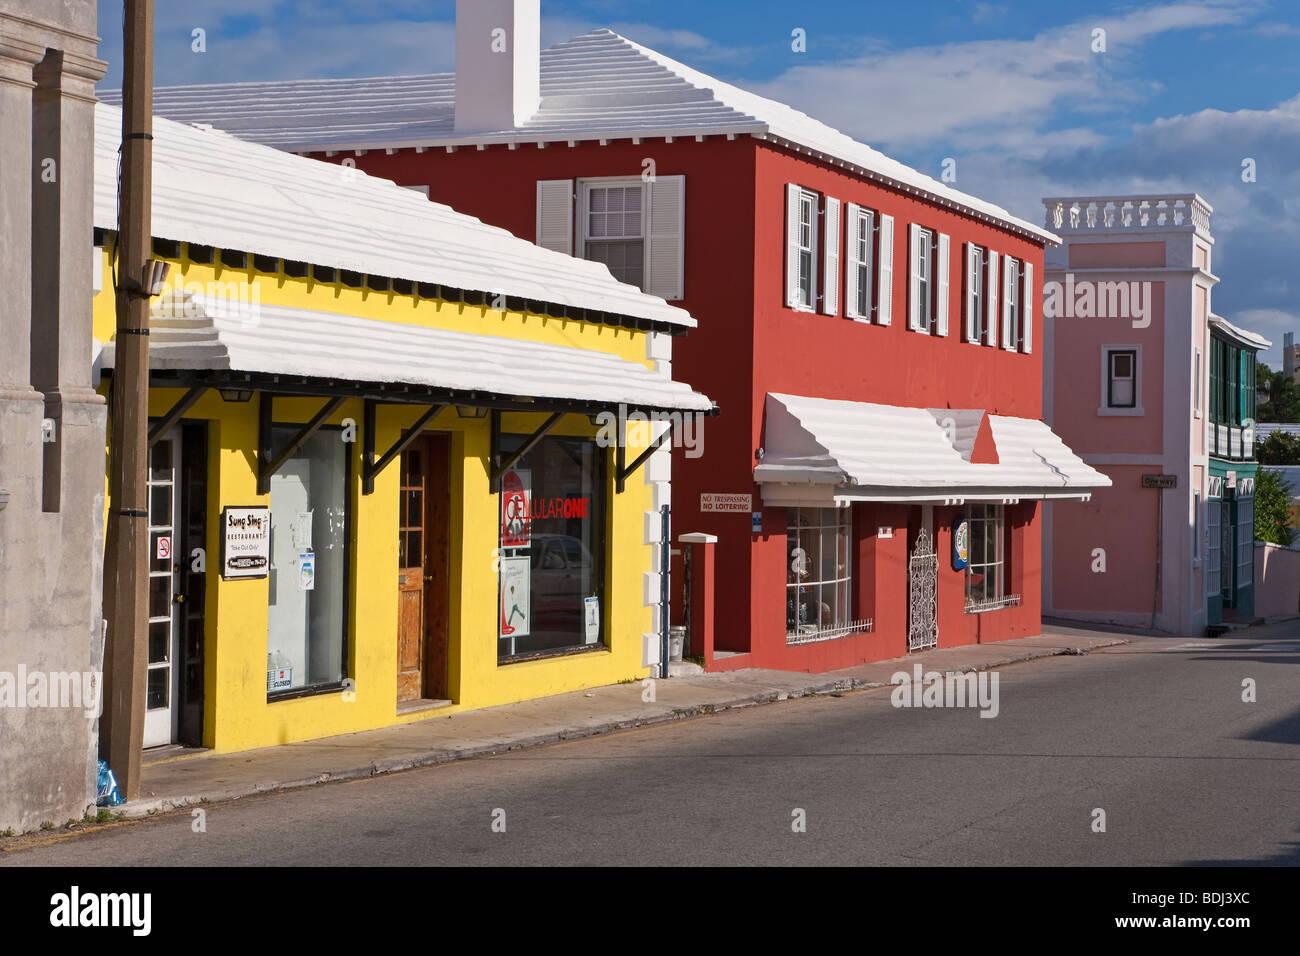 Bermuda, Atlantic Ocean, St. George's Parish, St George - Stock Image